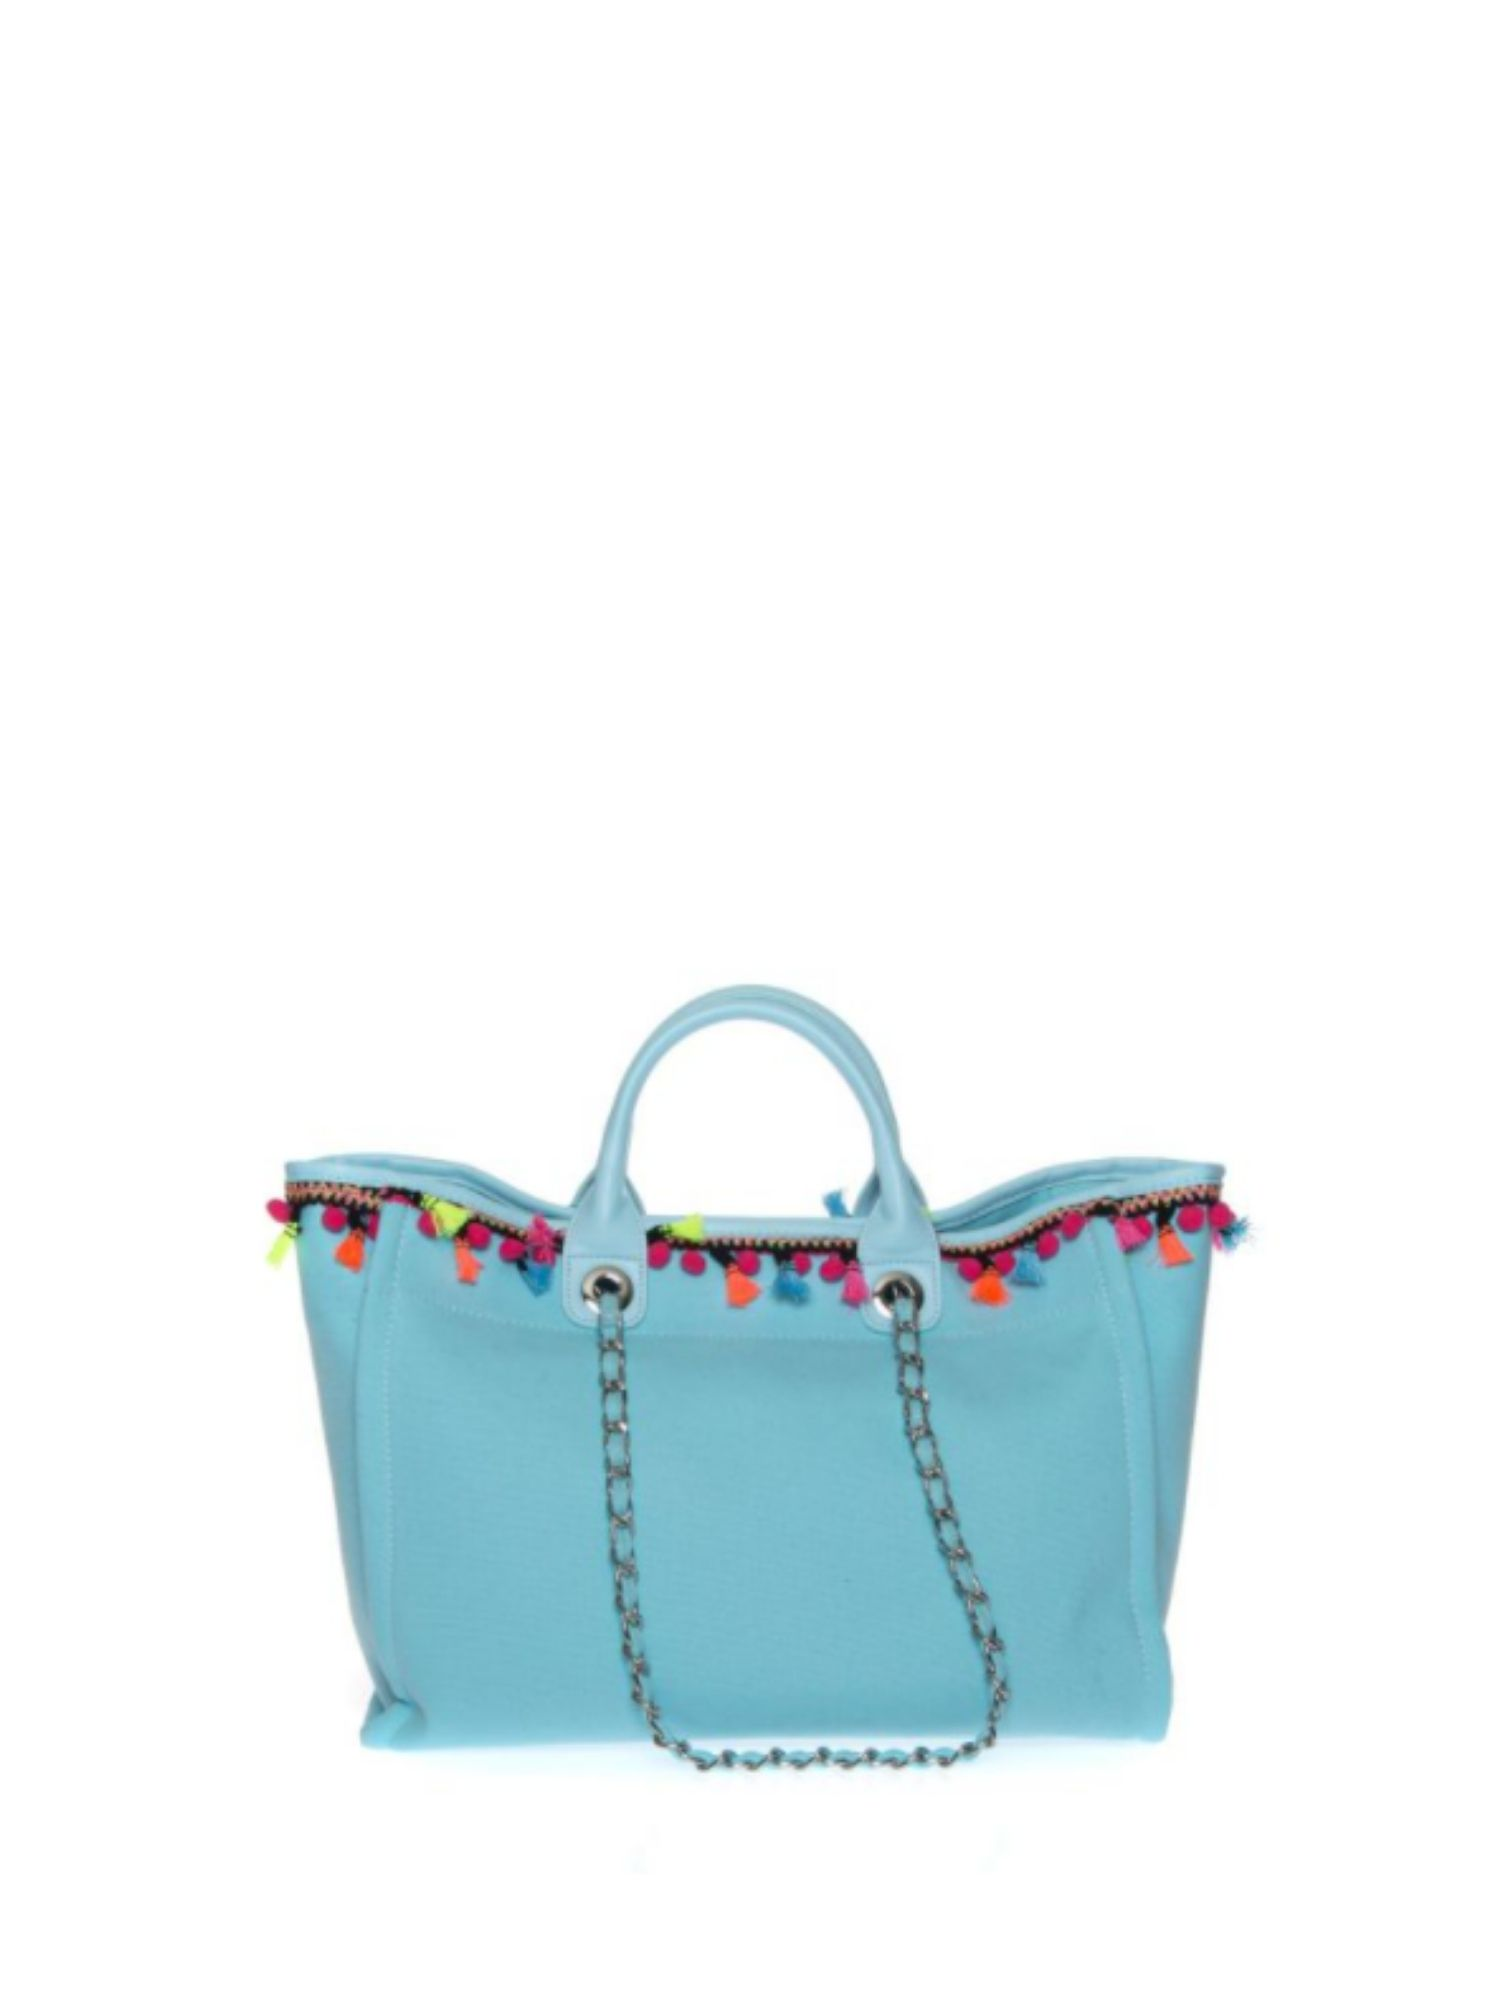 Borsa Atelier Du Sac Pash Bag 10999 Celeste 1